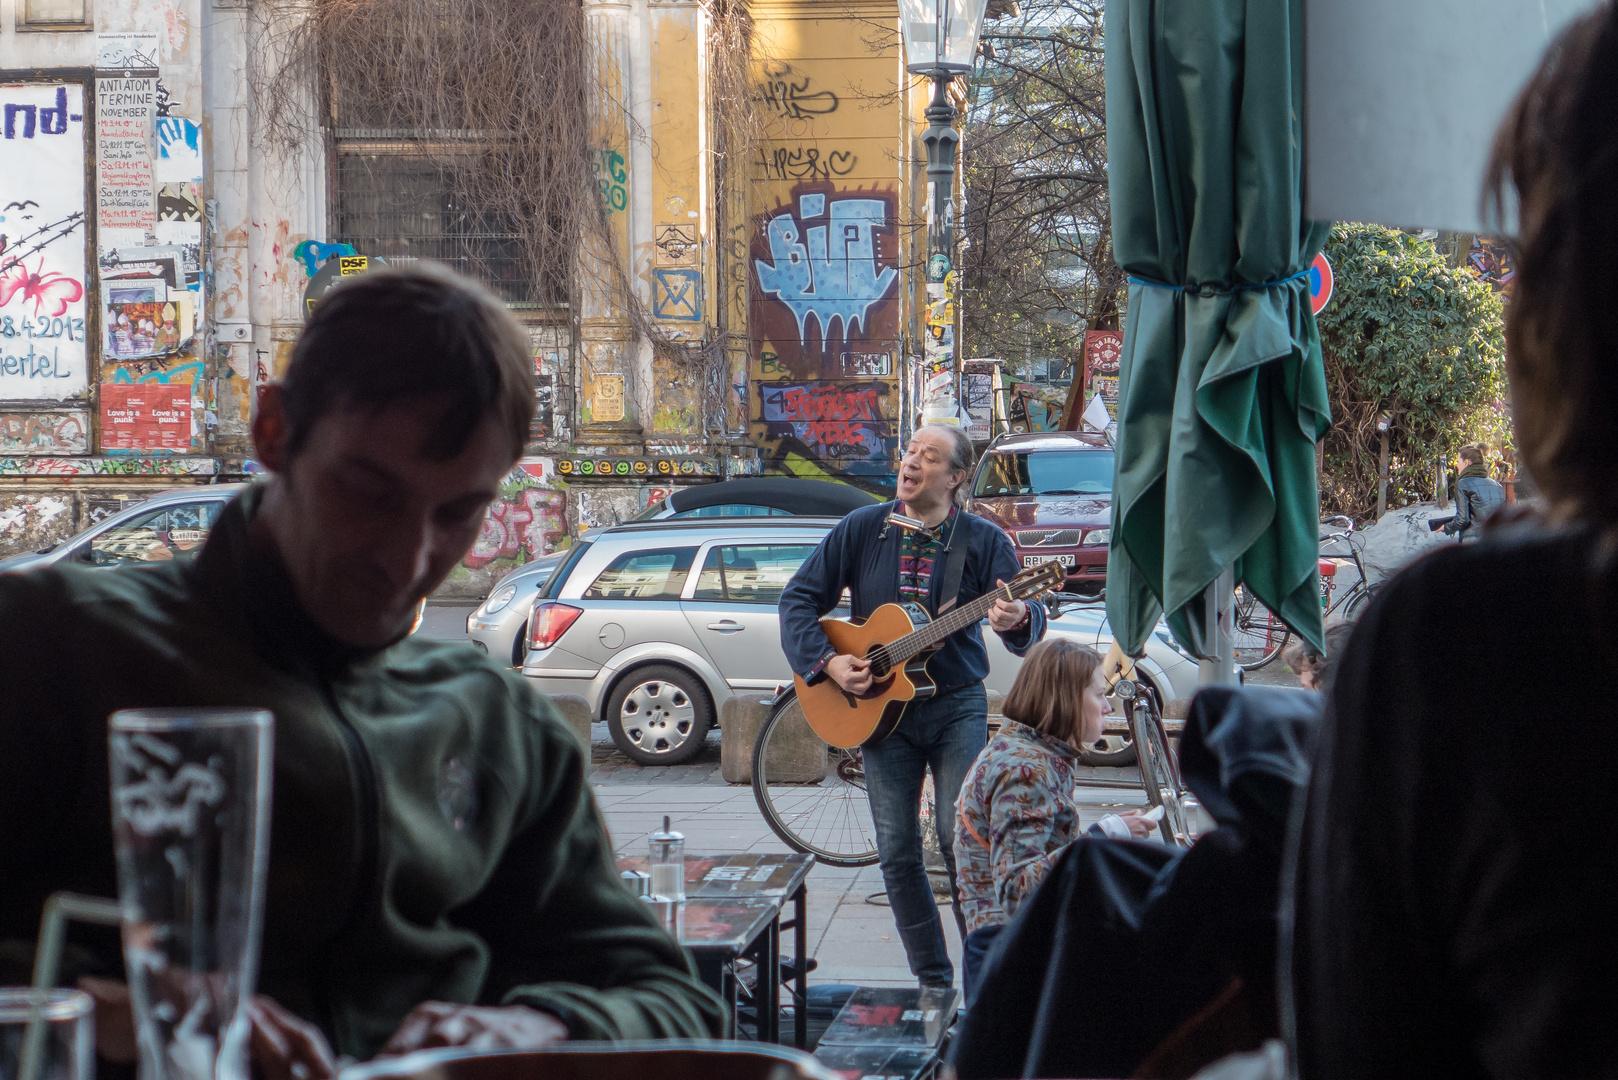 Straßenmusiker, St. Pauli